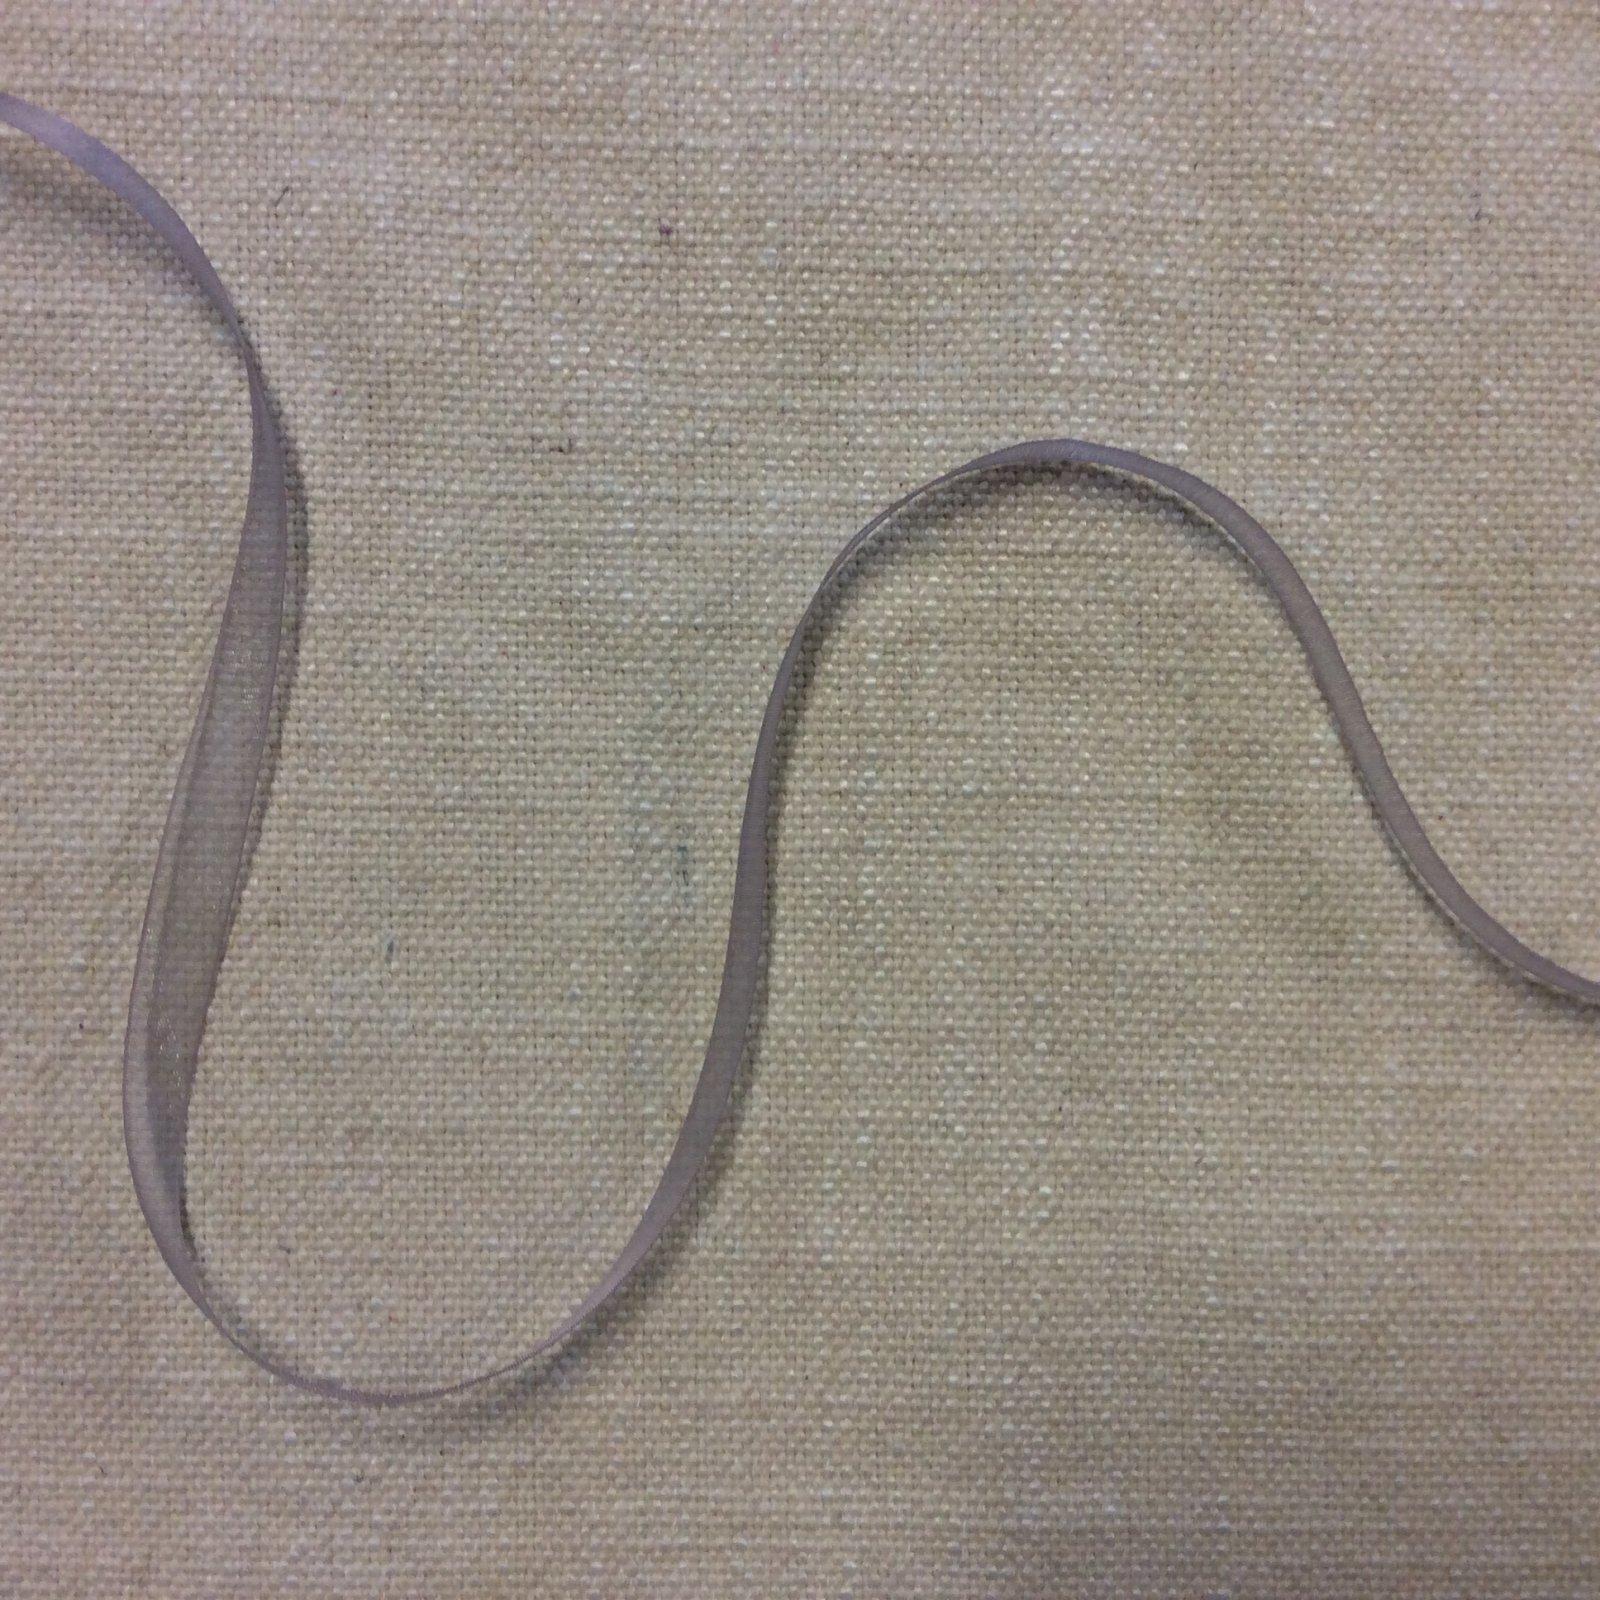 Organza Ribbon 3/8 Lightweight Soft Purple Gray Trim Ribbon RIB1212